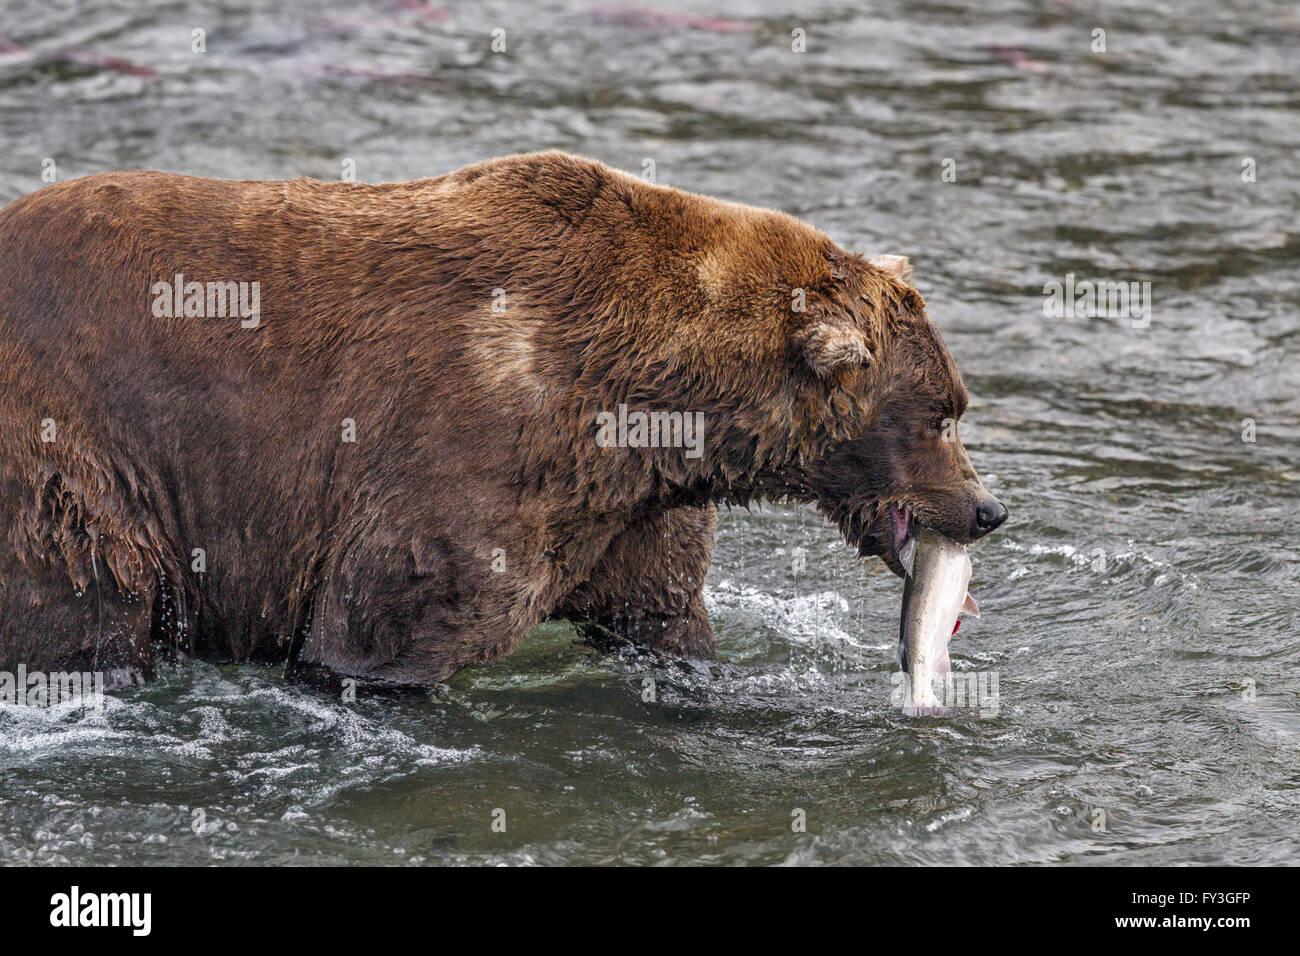 Male brown bear catching spawning salmon at Brooks Falls, Katmai National Park, Alaska - Stock Image